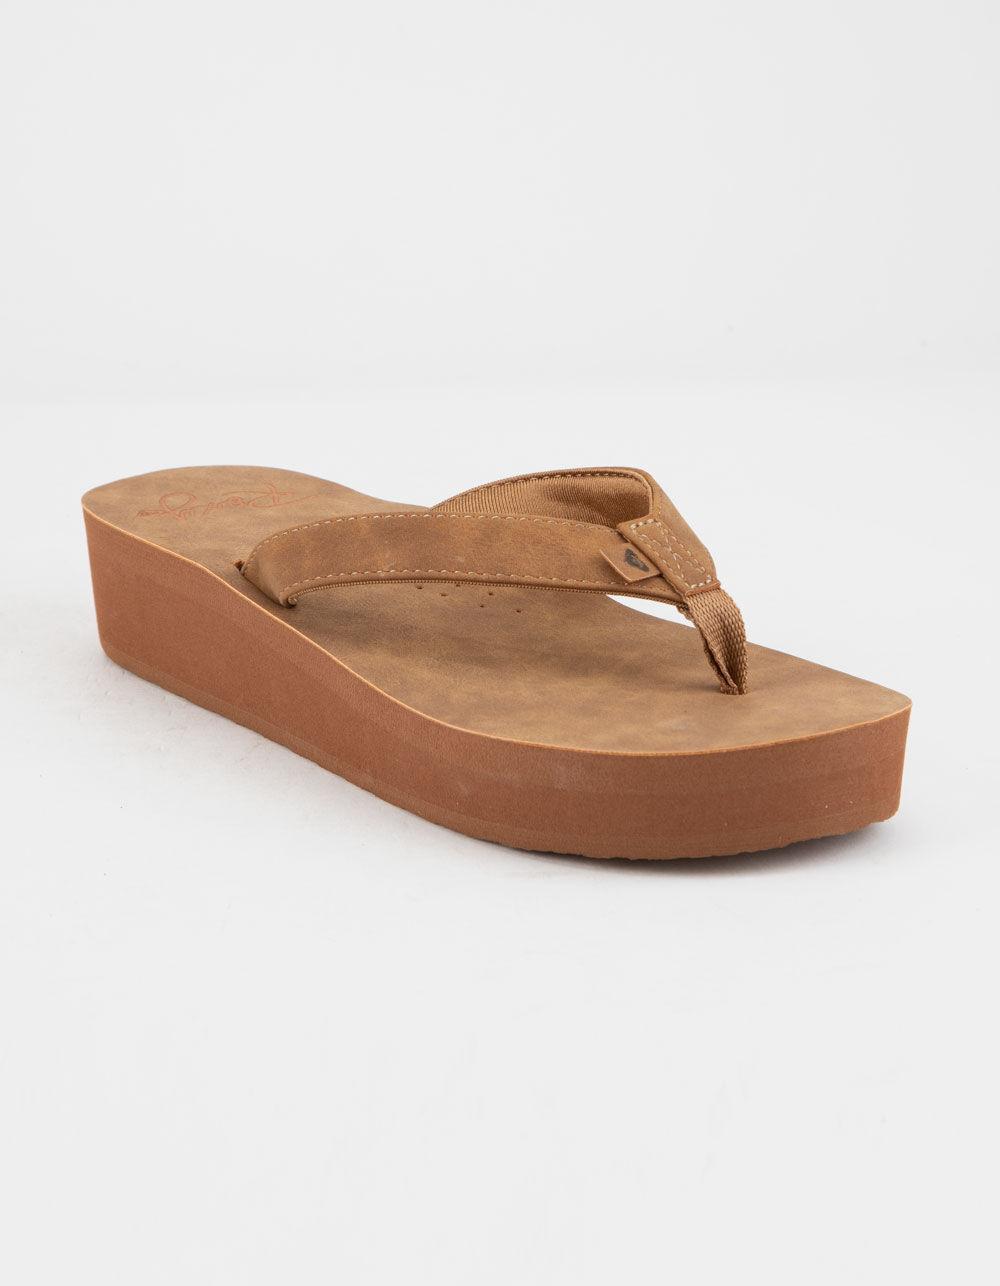 ROXY Melinda Tan Platform Sandals